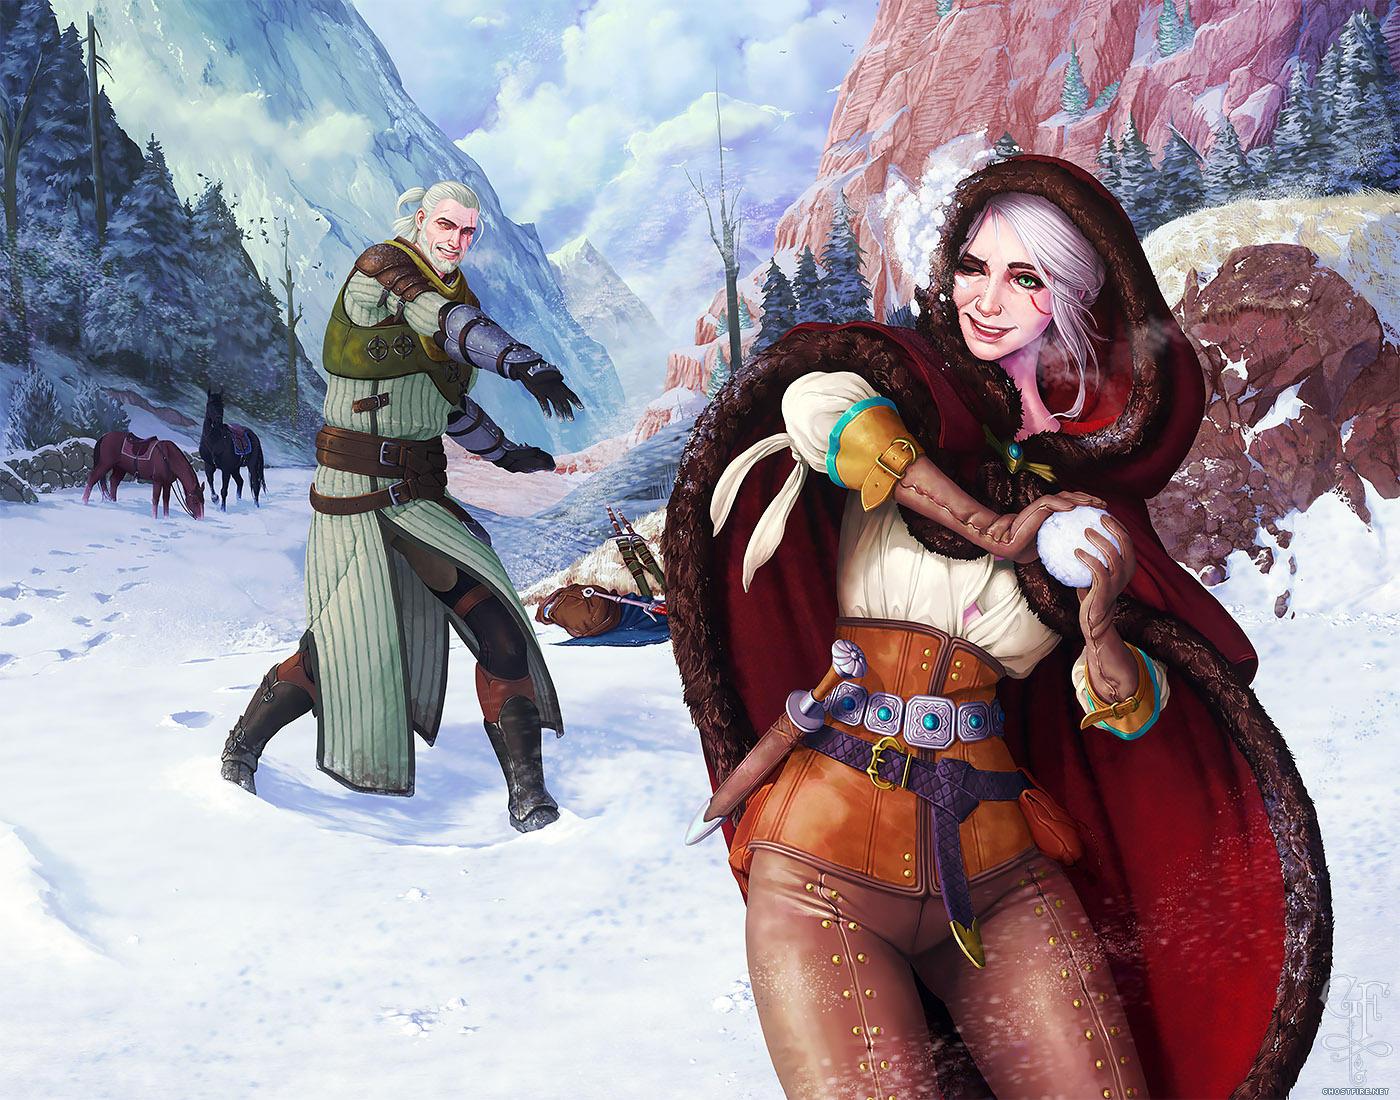 6FLbV7HF0ns.jpg - Witcher 3: Wild Hunt, the Арт